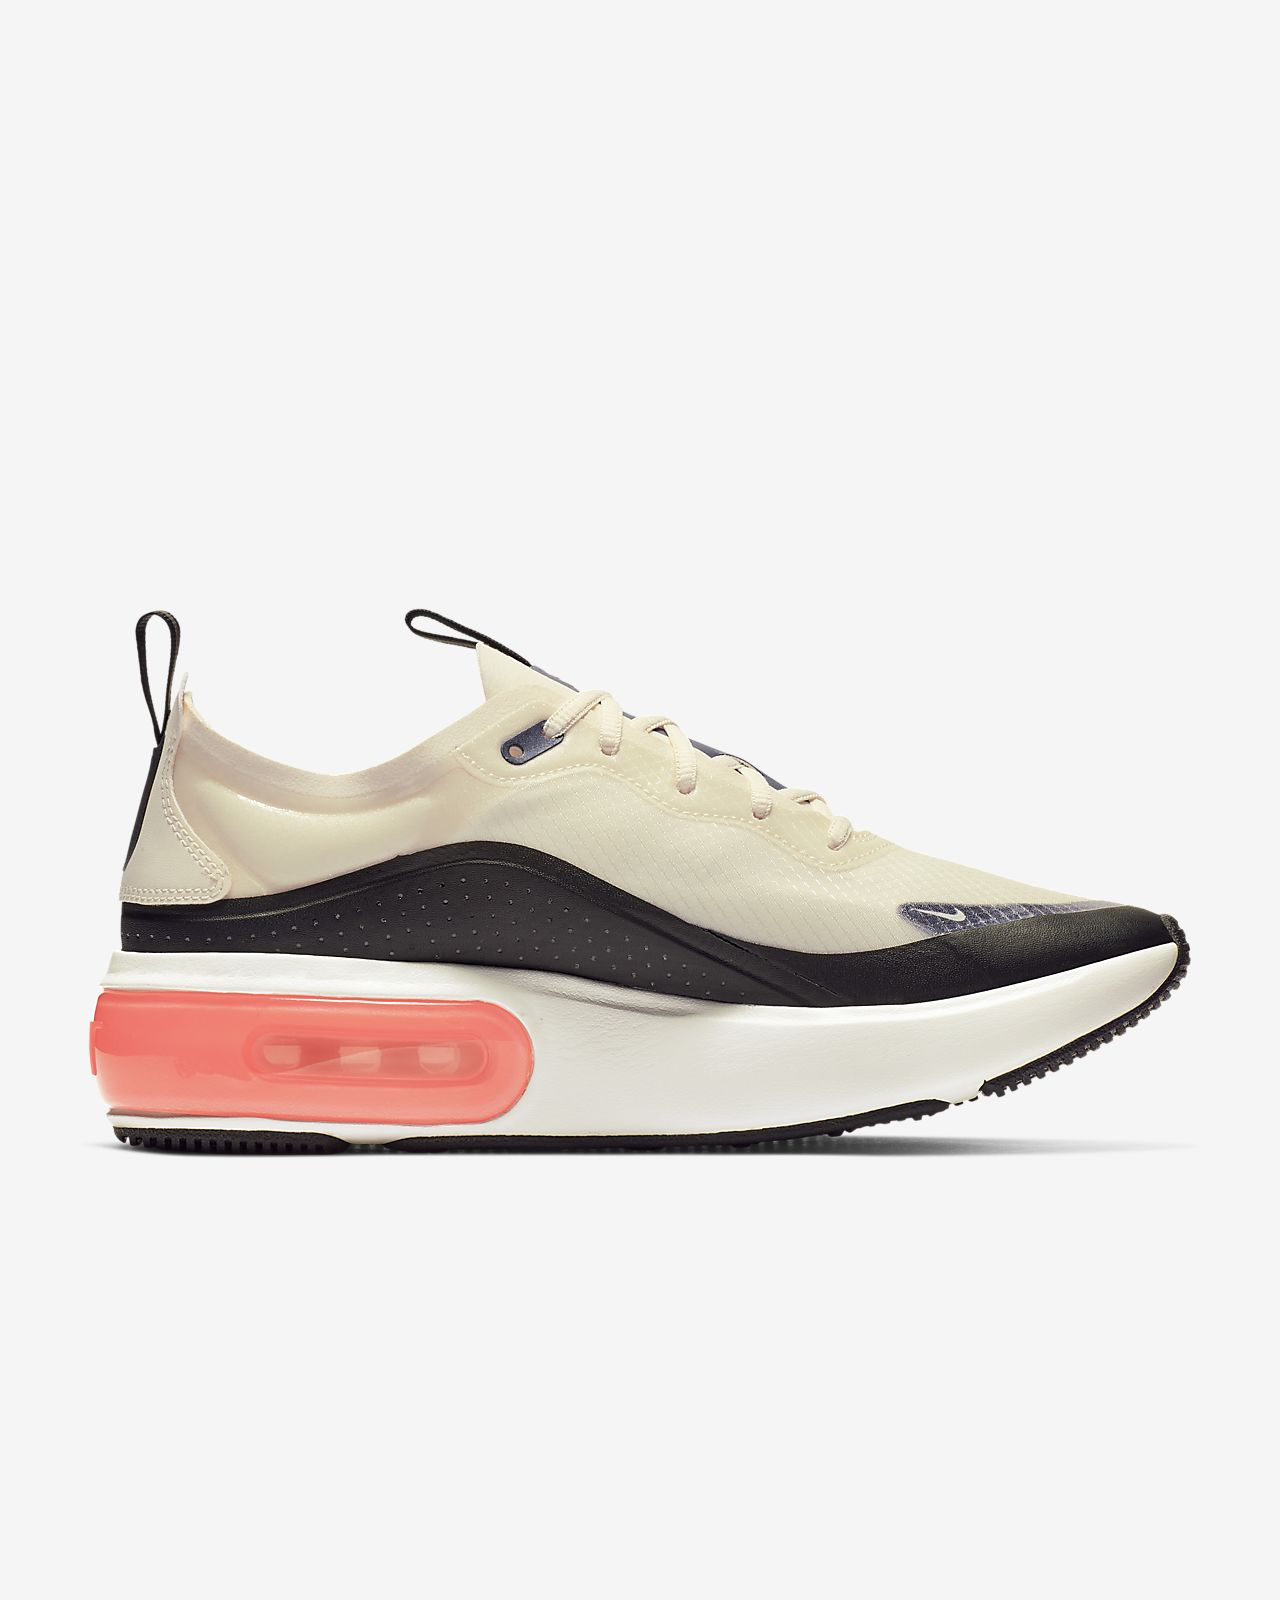 check out 0fc6d dc3e4 ... Nike Air Max Dia SE Shoe